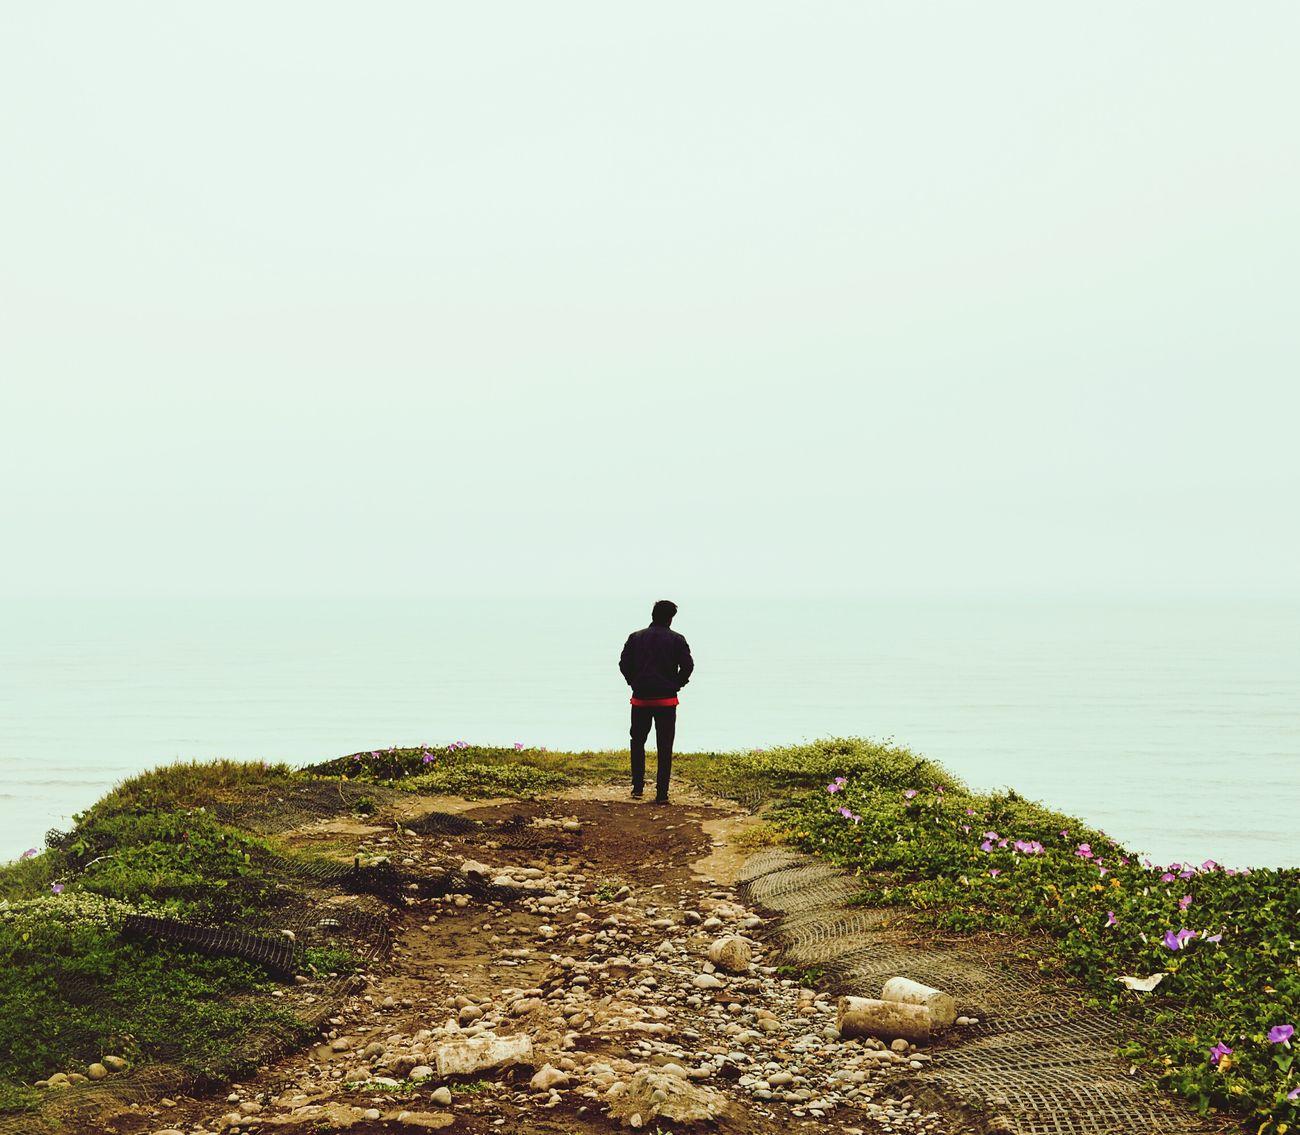 Man Walking Photography Photographer Marketing Ads Facebook Adan